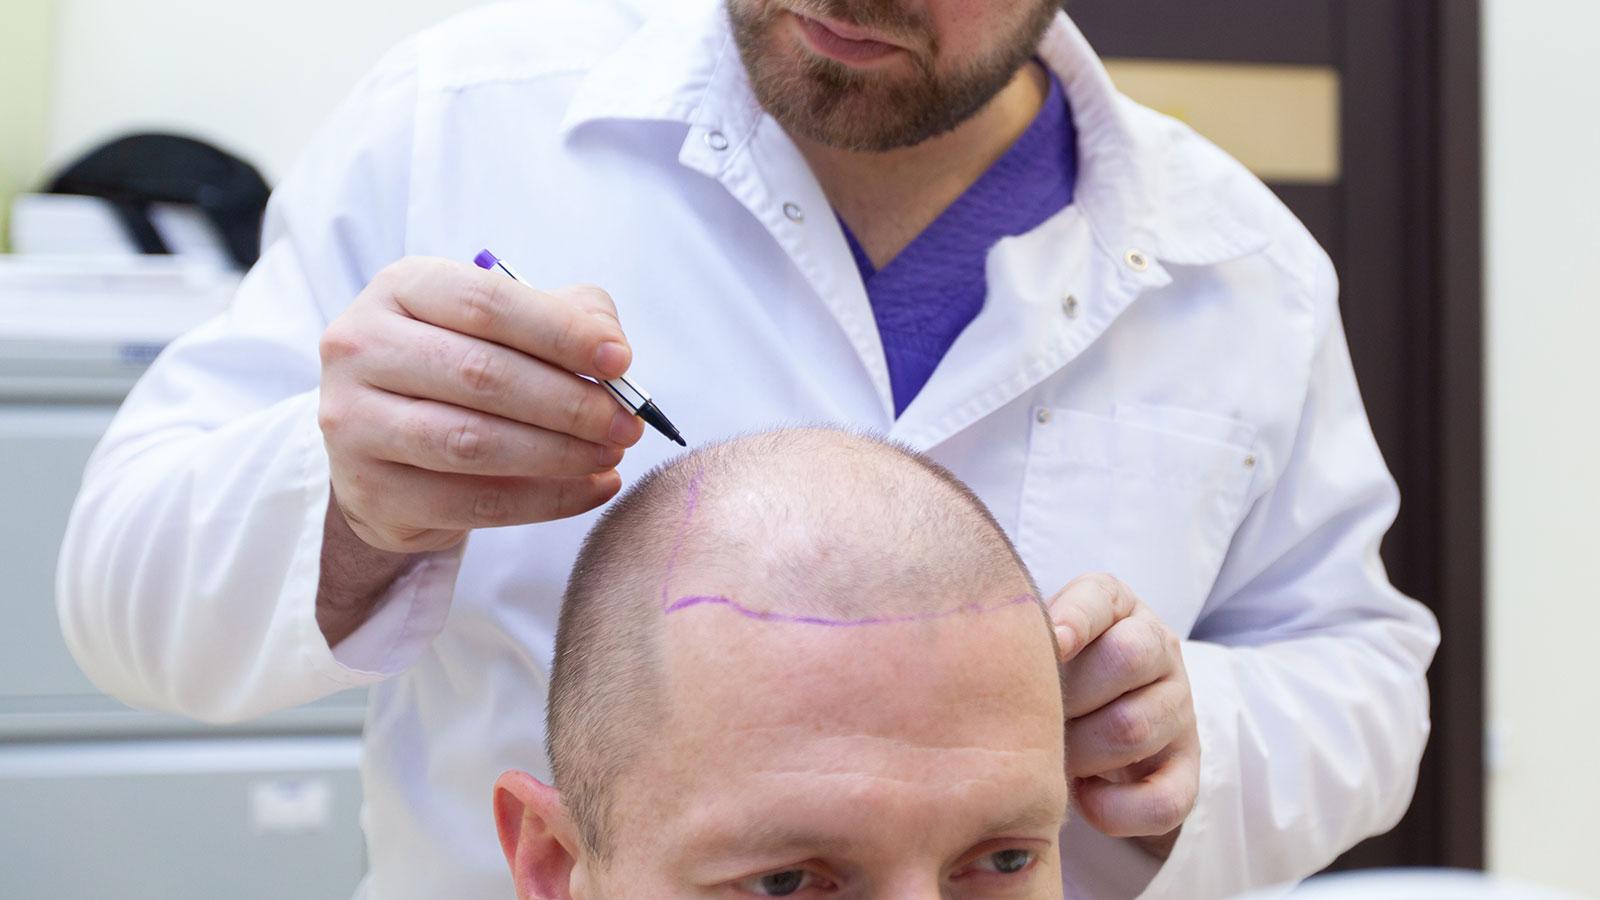 Trasplante de cabello vs Microinjerto de cabello